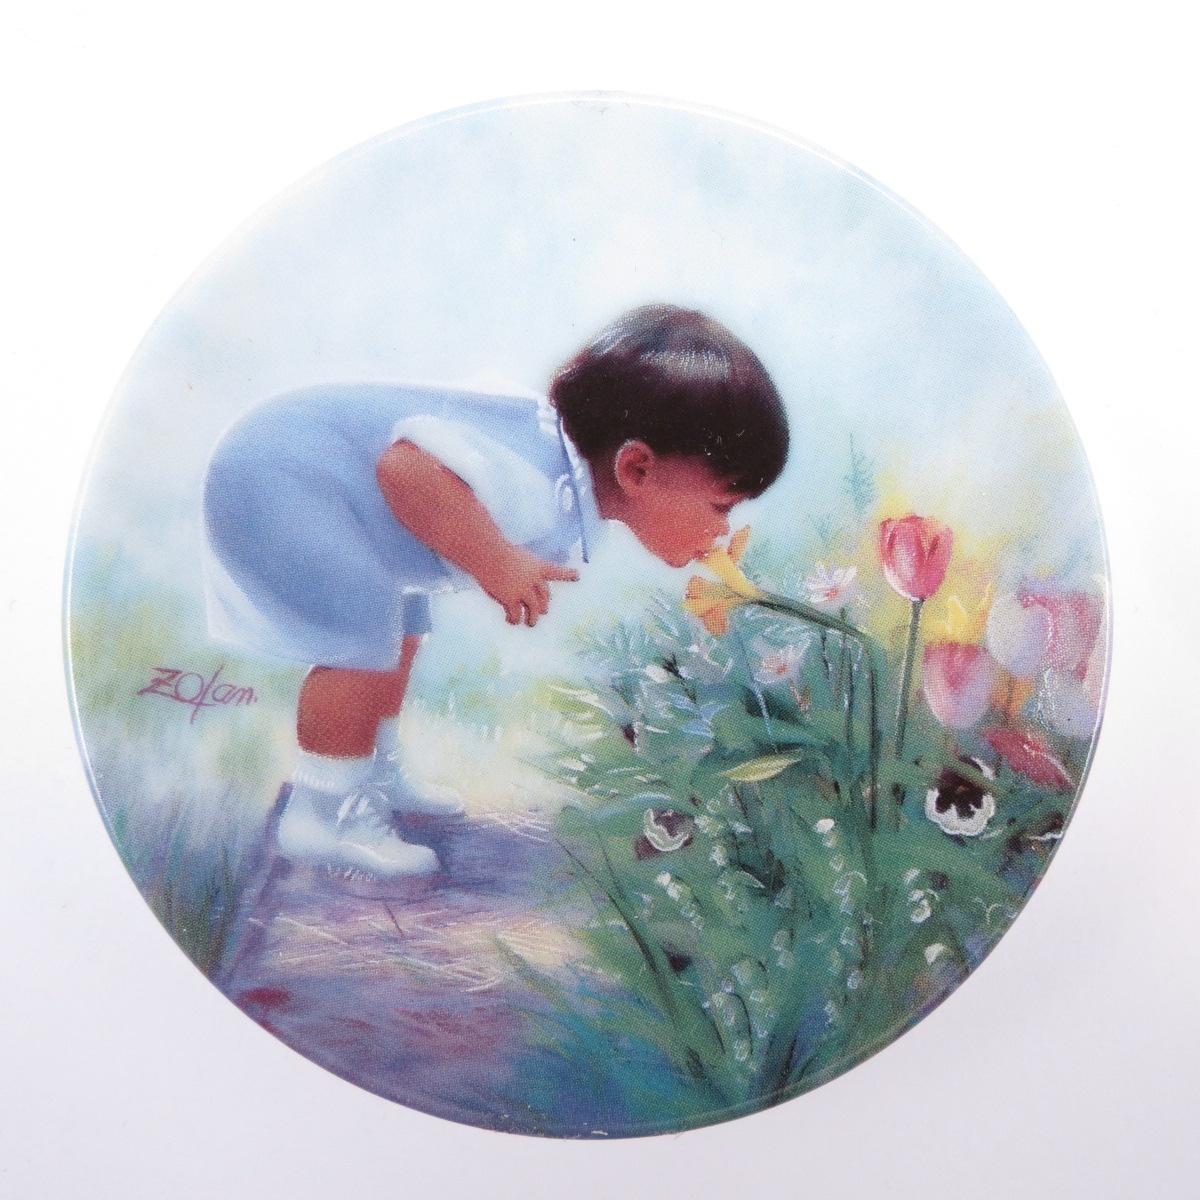 Декоративная тарелка Pemberton & Oakes Любимый детский художник Америки, 91453998